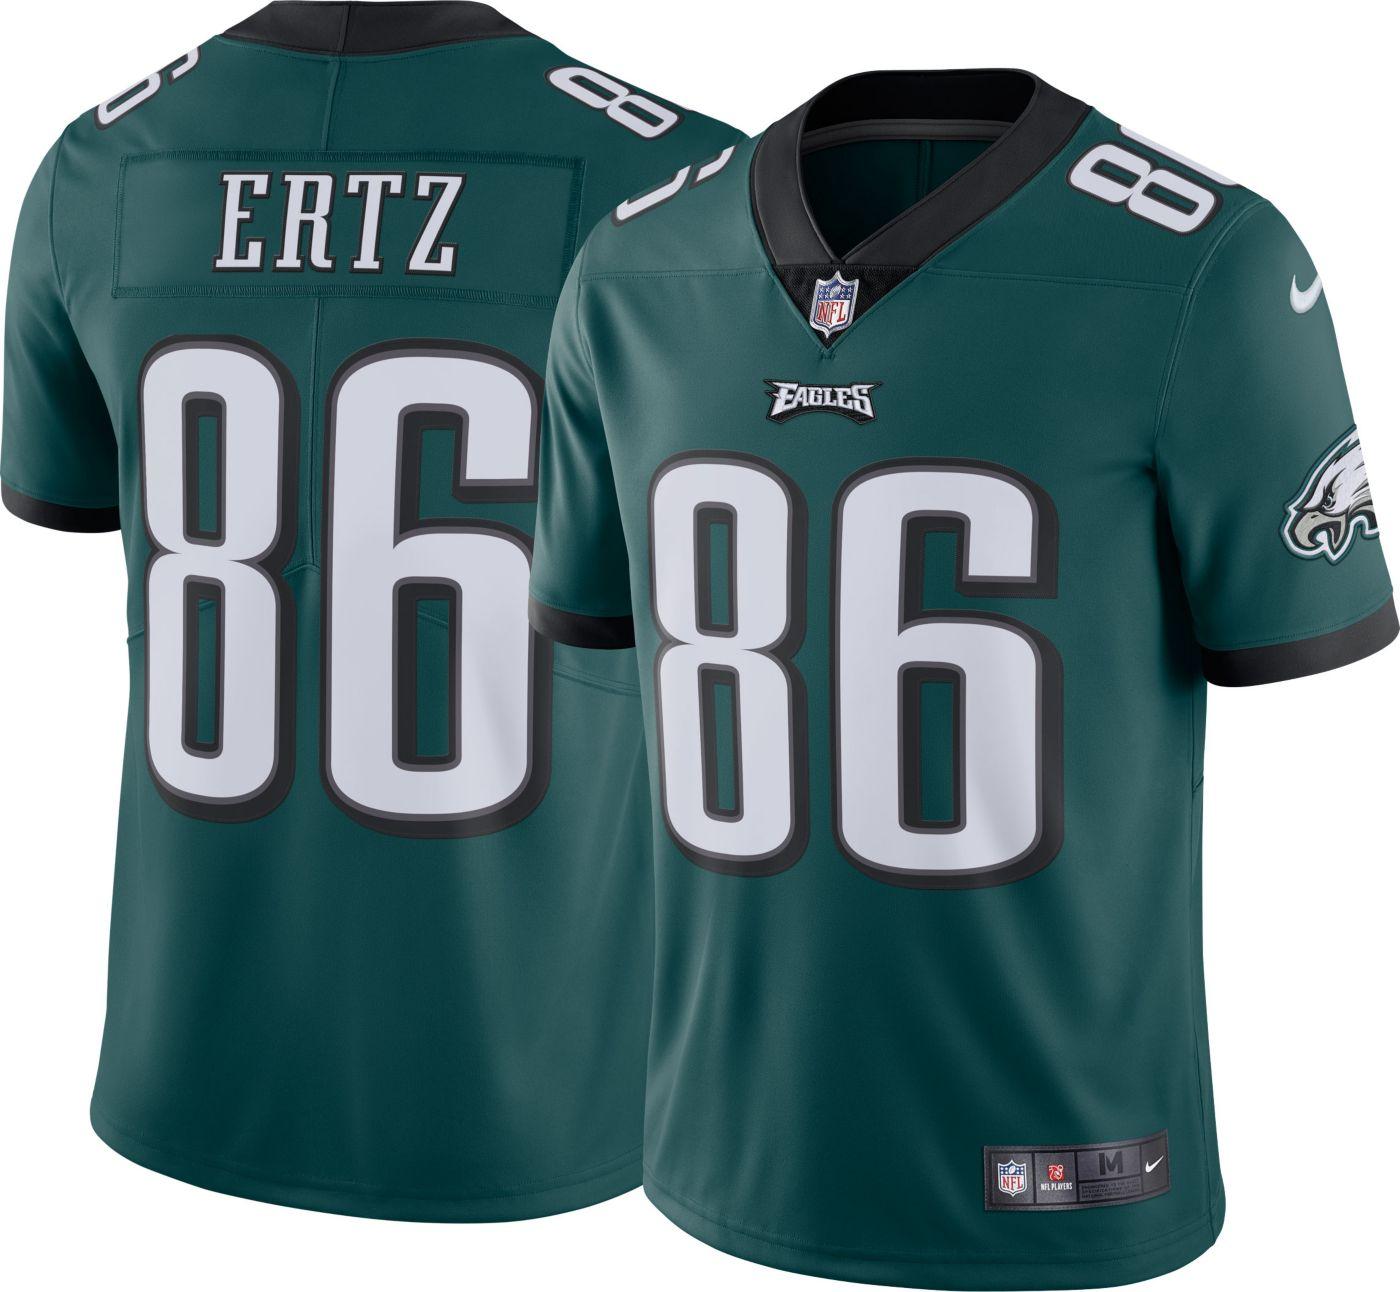 Nike Men's Home Limited Jersey Philadelphia Eagles Zach Ertz #86